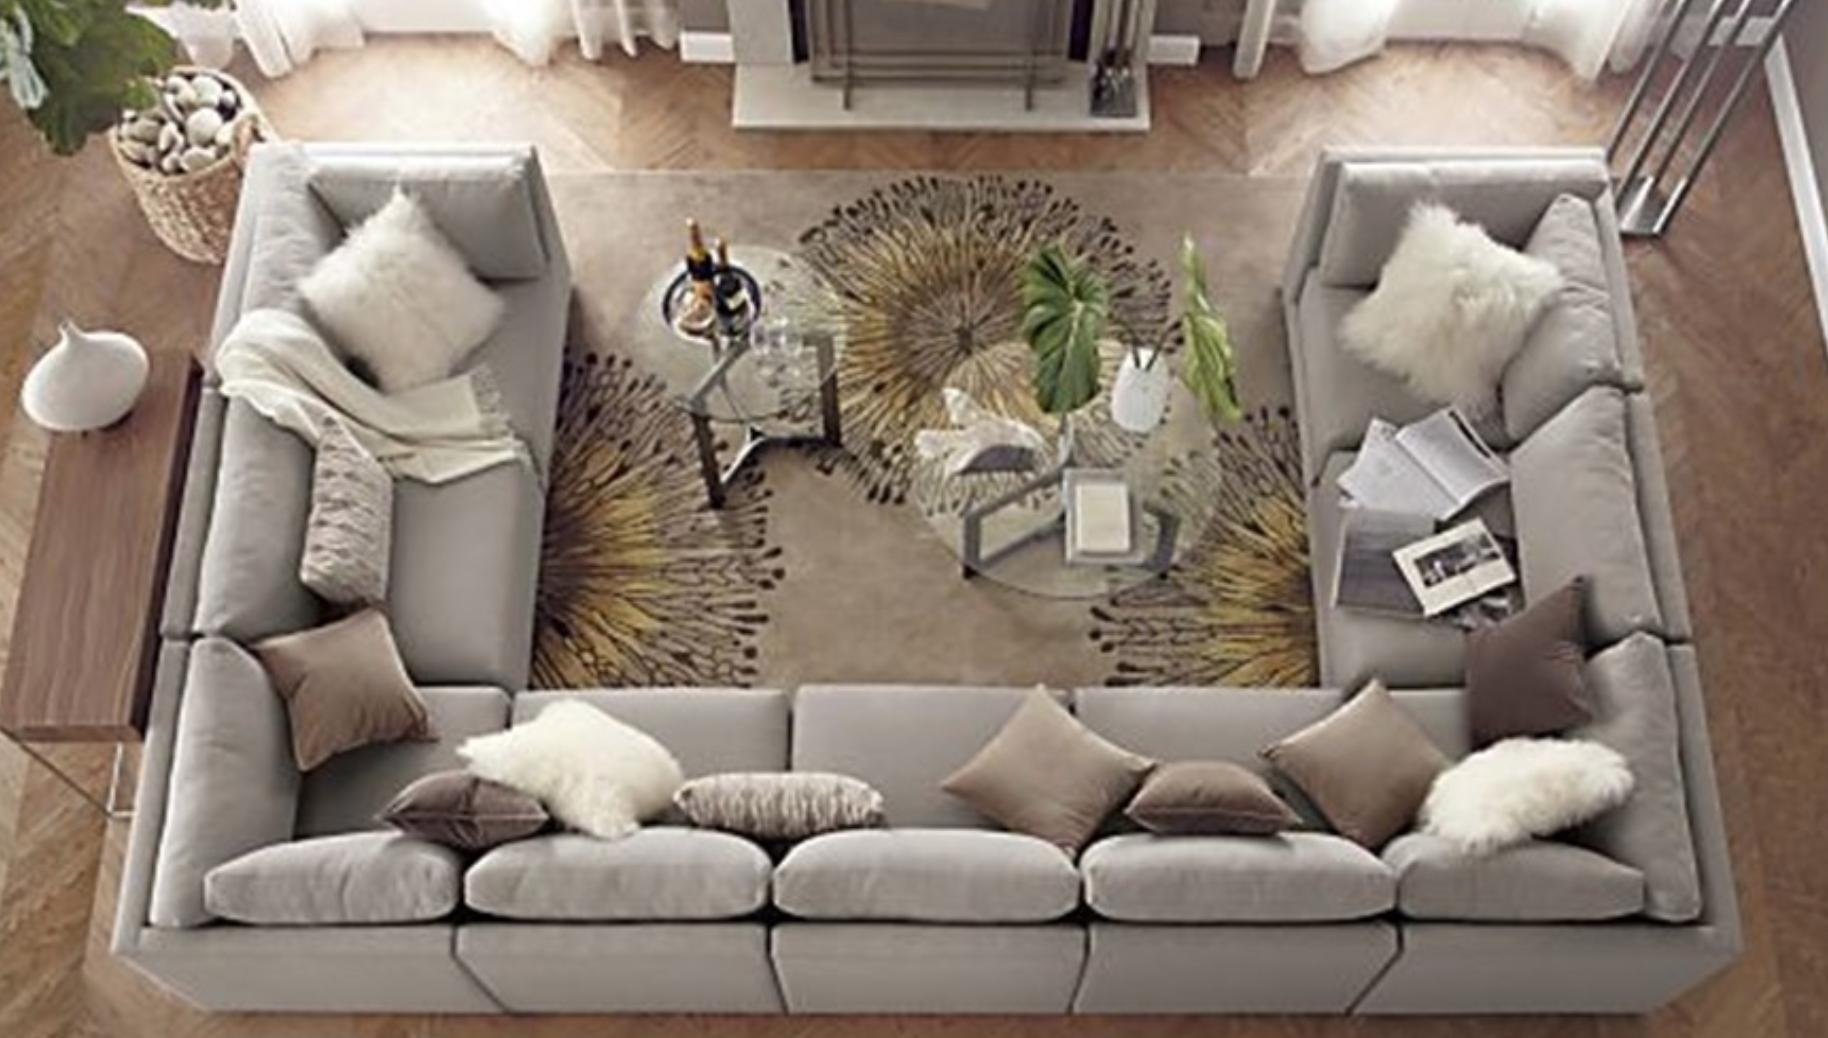 super popular 3588b feb81 u shape sofa | Nuwe Huisie ♡♡ in 2019 | U shaped sofa, U ...